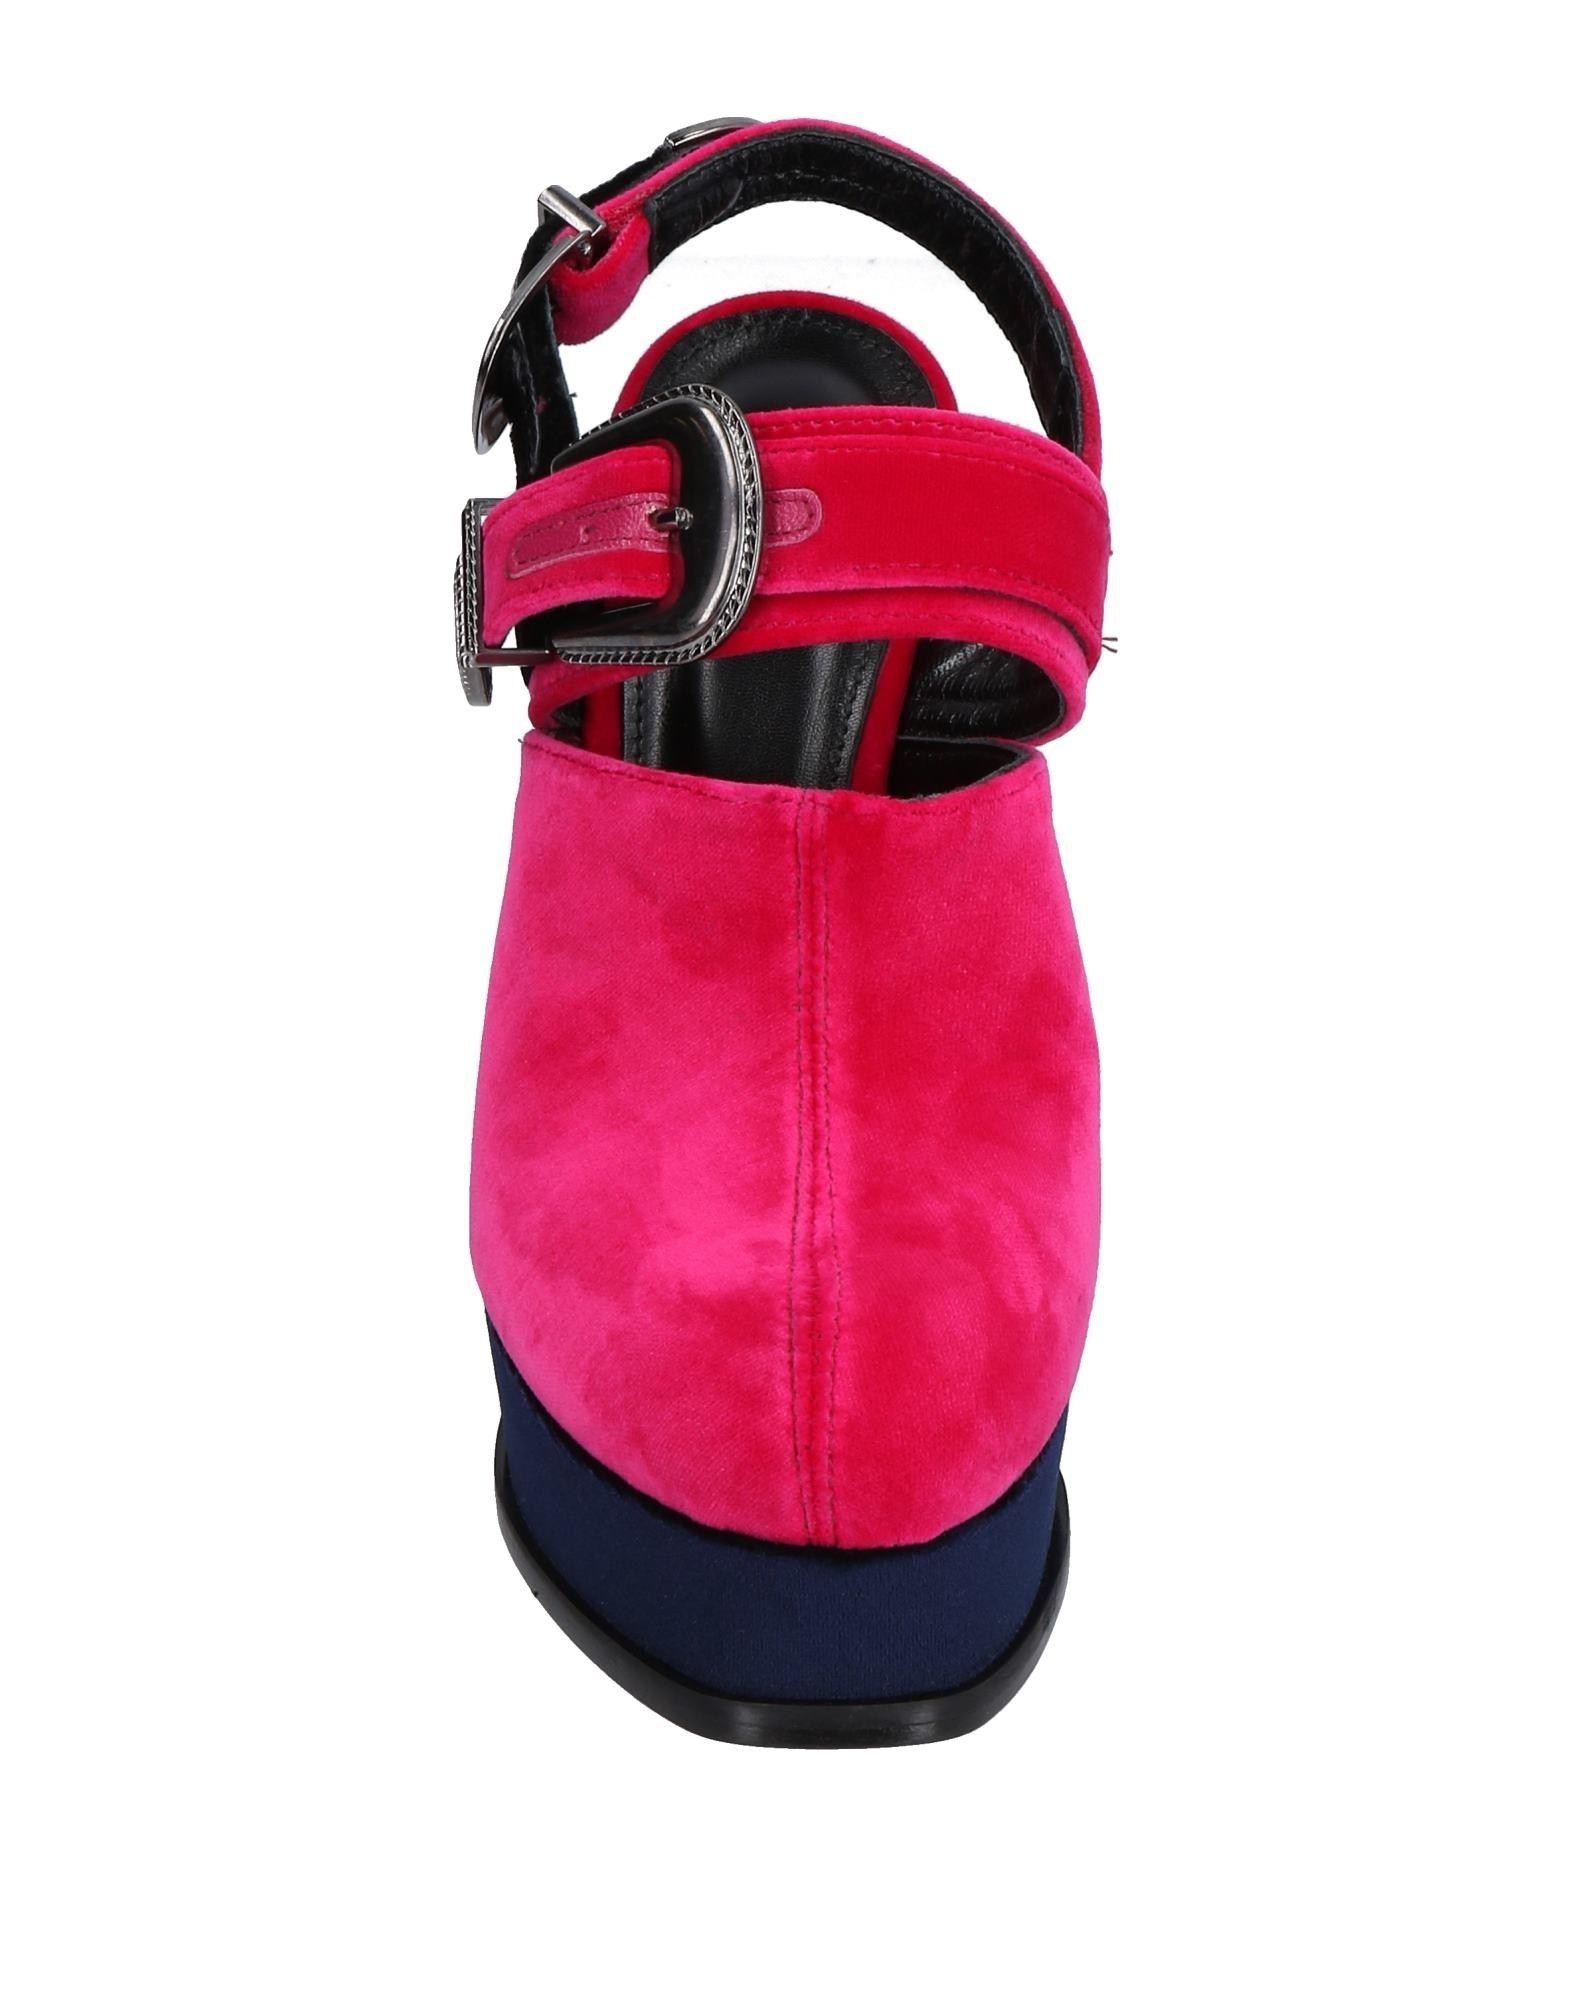 Tipe E Tacchi Pumps beliebte Damen  11519433BK Gute Qualität beliebte Pumps Schuhe fbf0e5